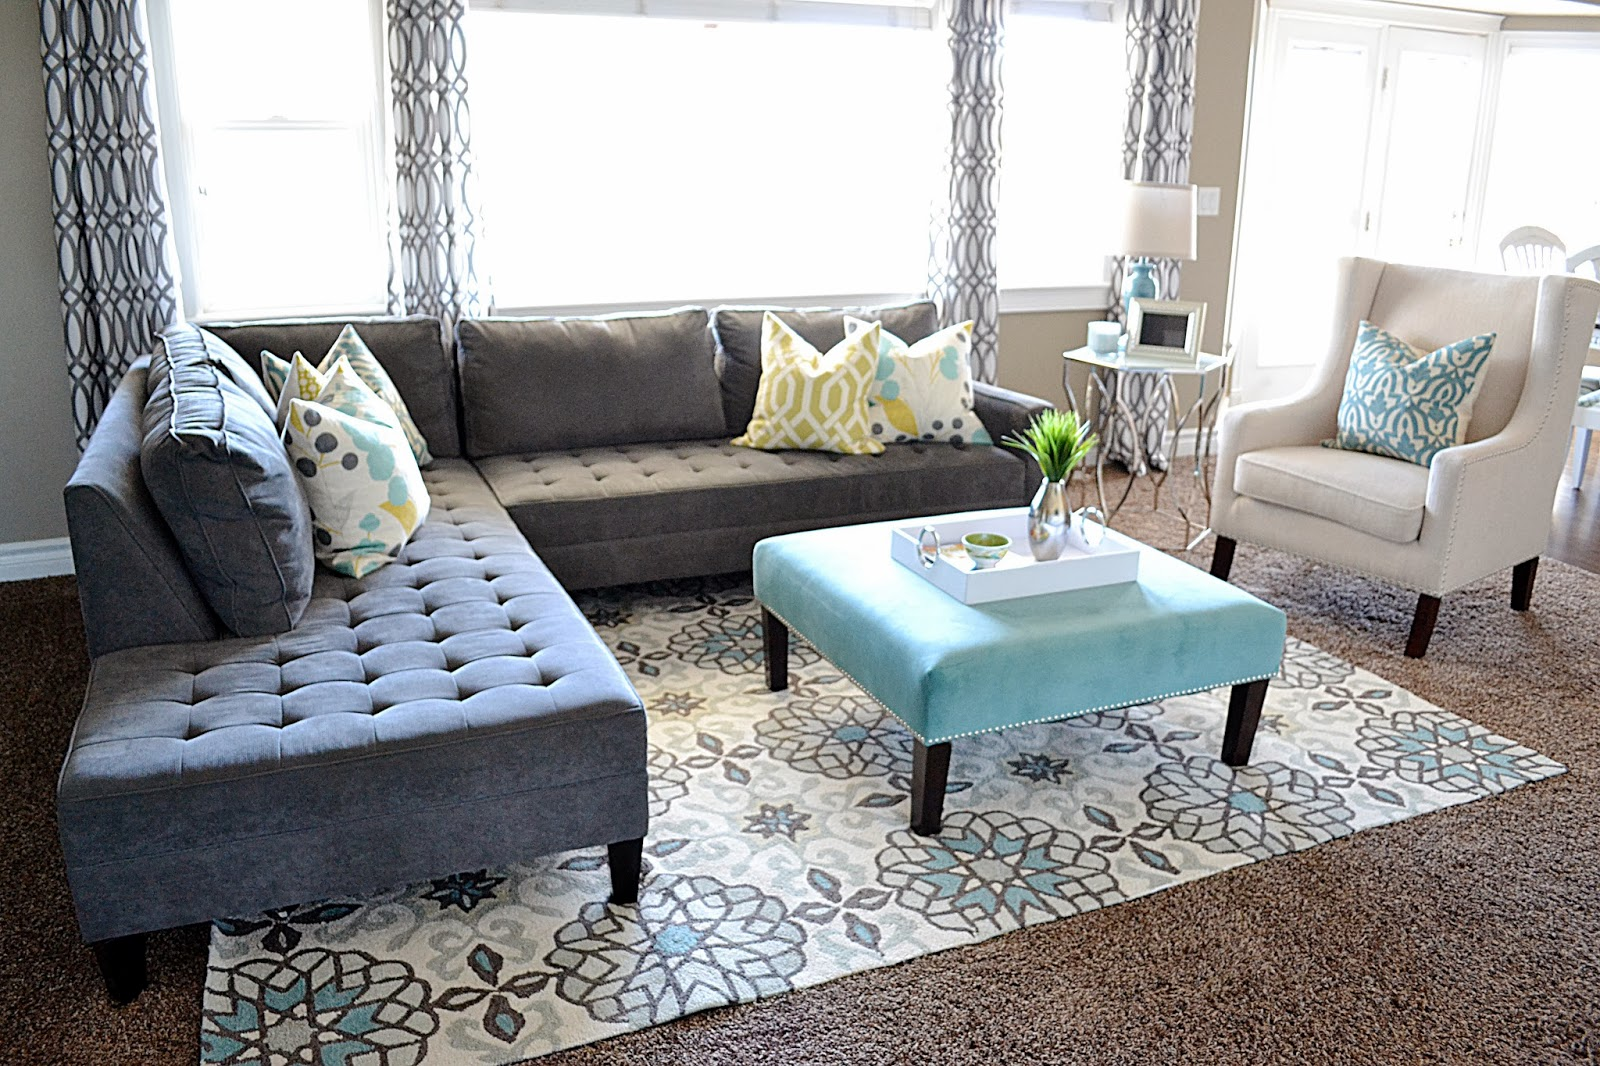 Sita montgomery interiors portfolio - Pleasing retreat home design granting the refreshing mountainous view ...